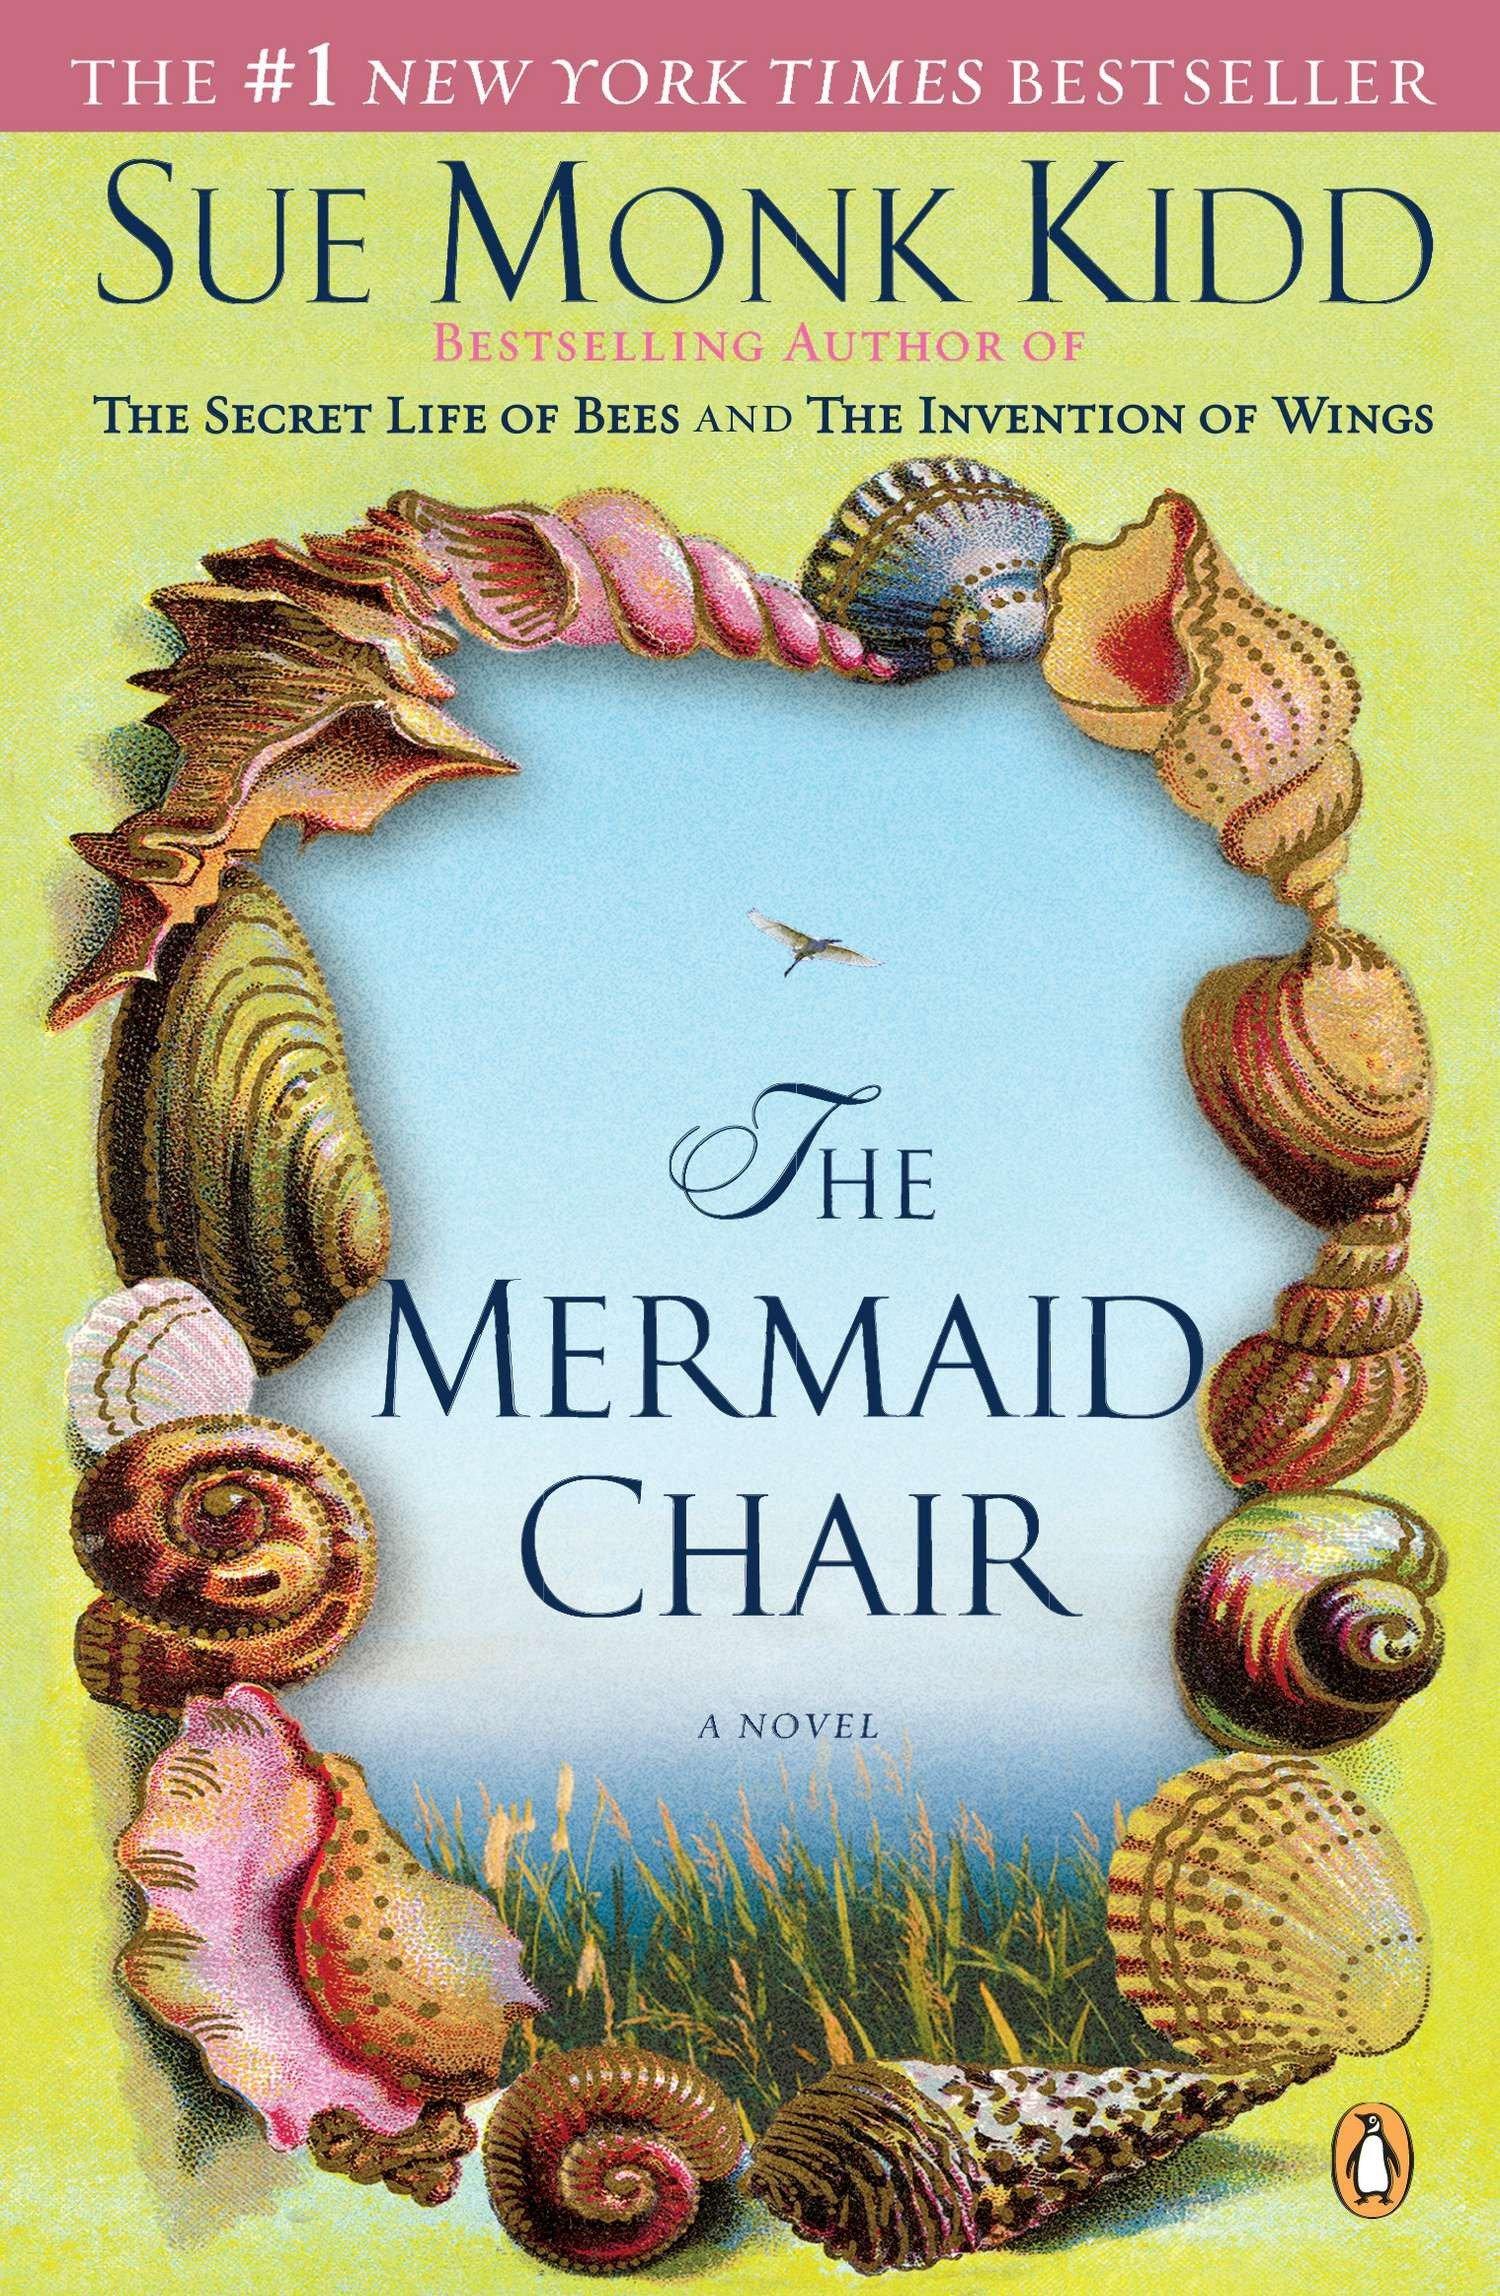 Follow the Author  sc 1 st  Amazon.com & The Mermaid Chair: Sue Monk Kidd: 9780143036692: Amazon.com: Books